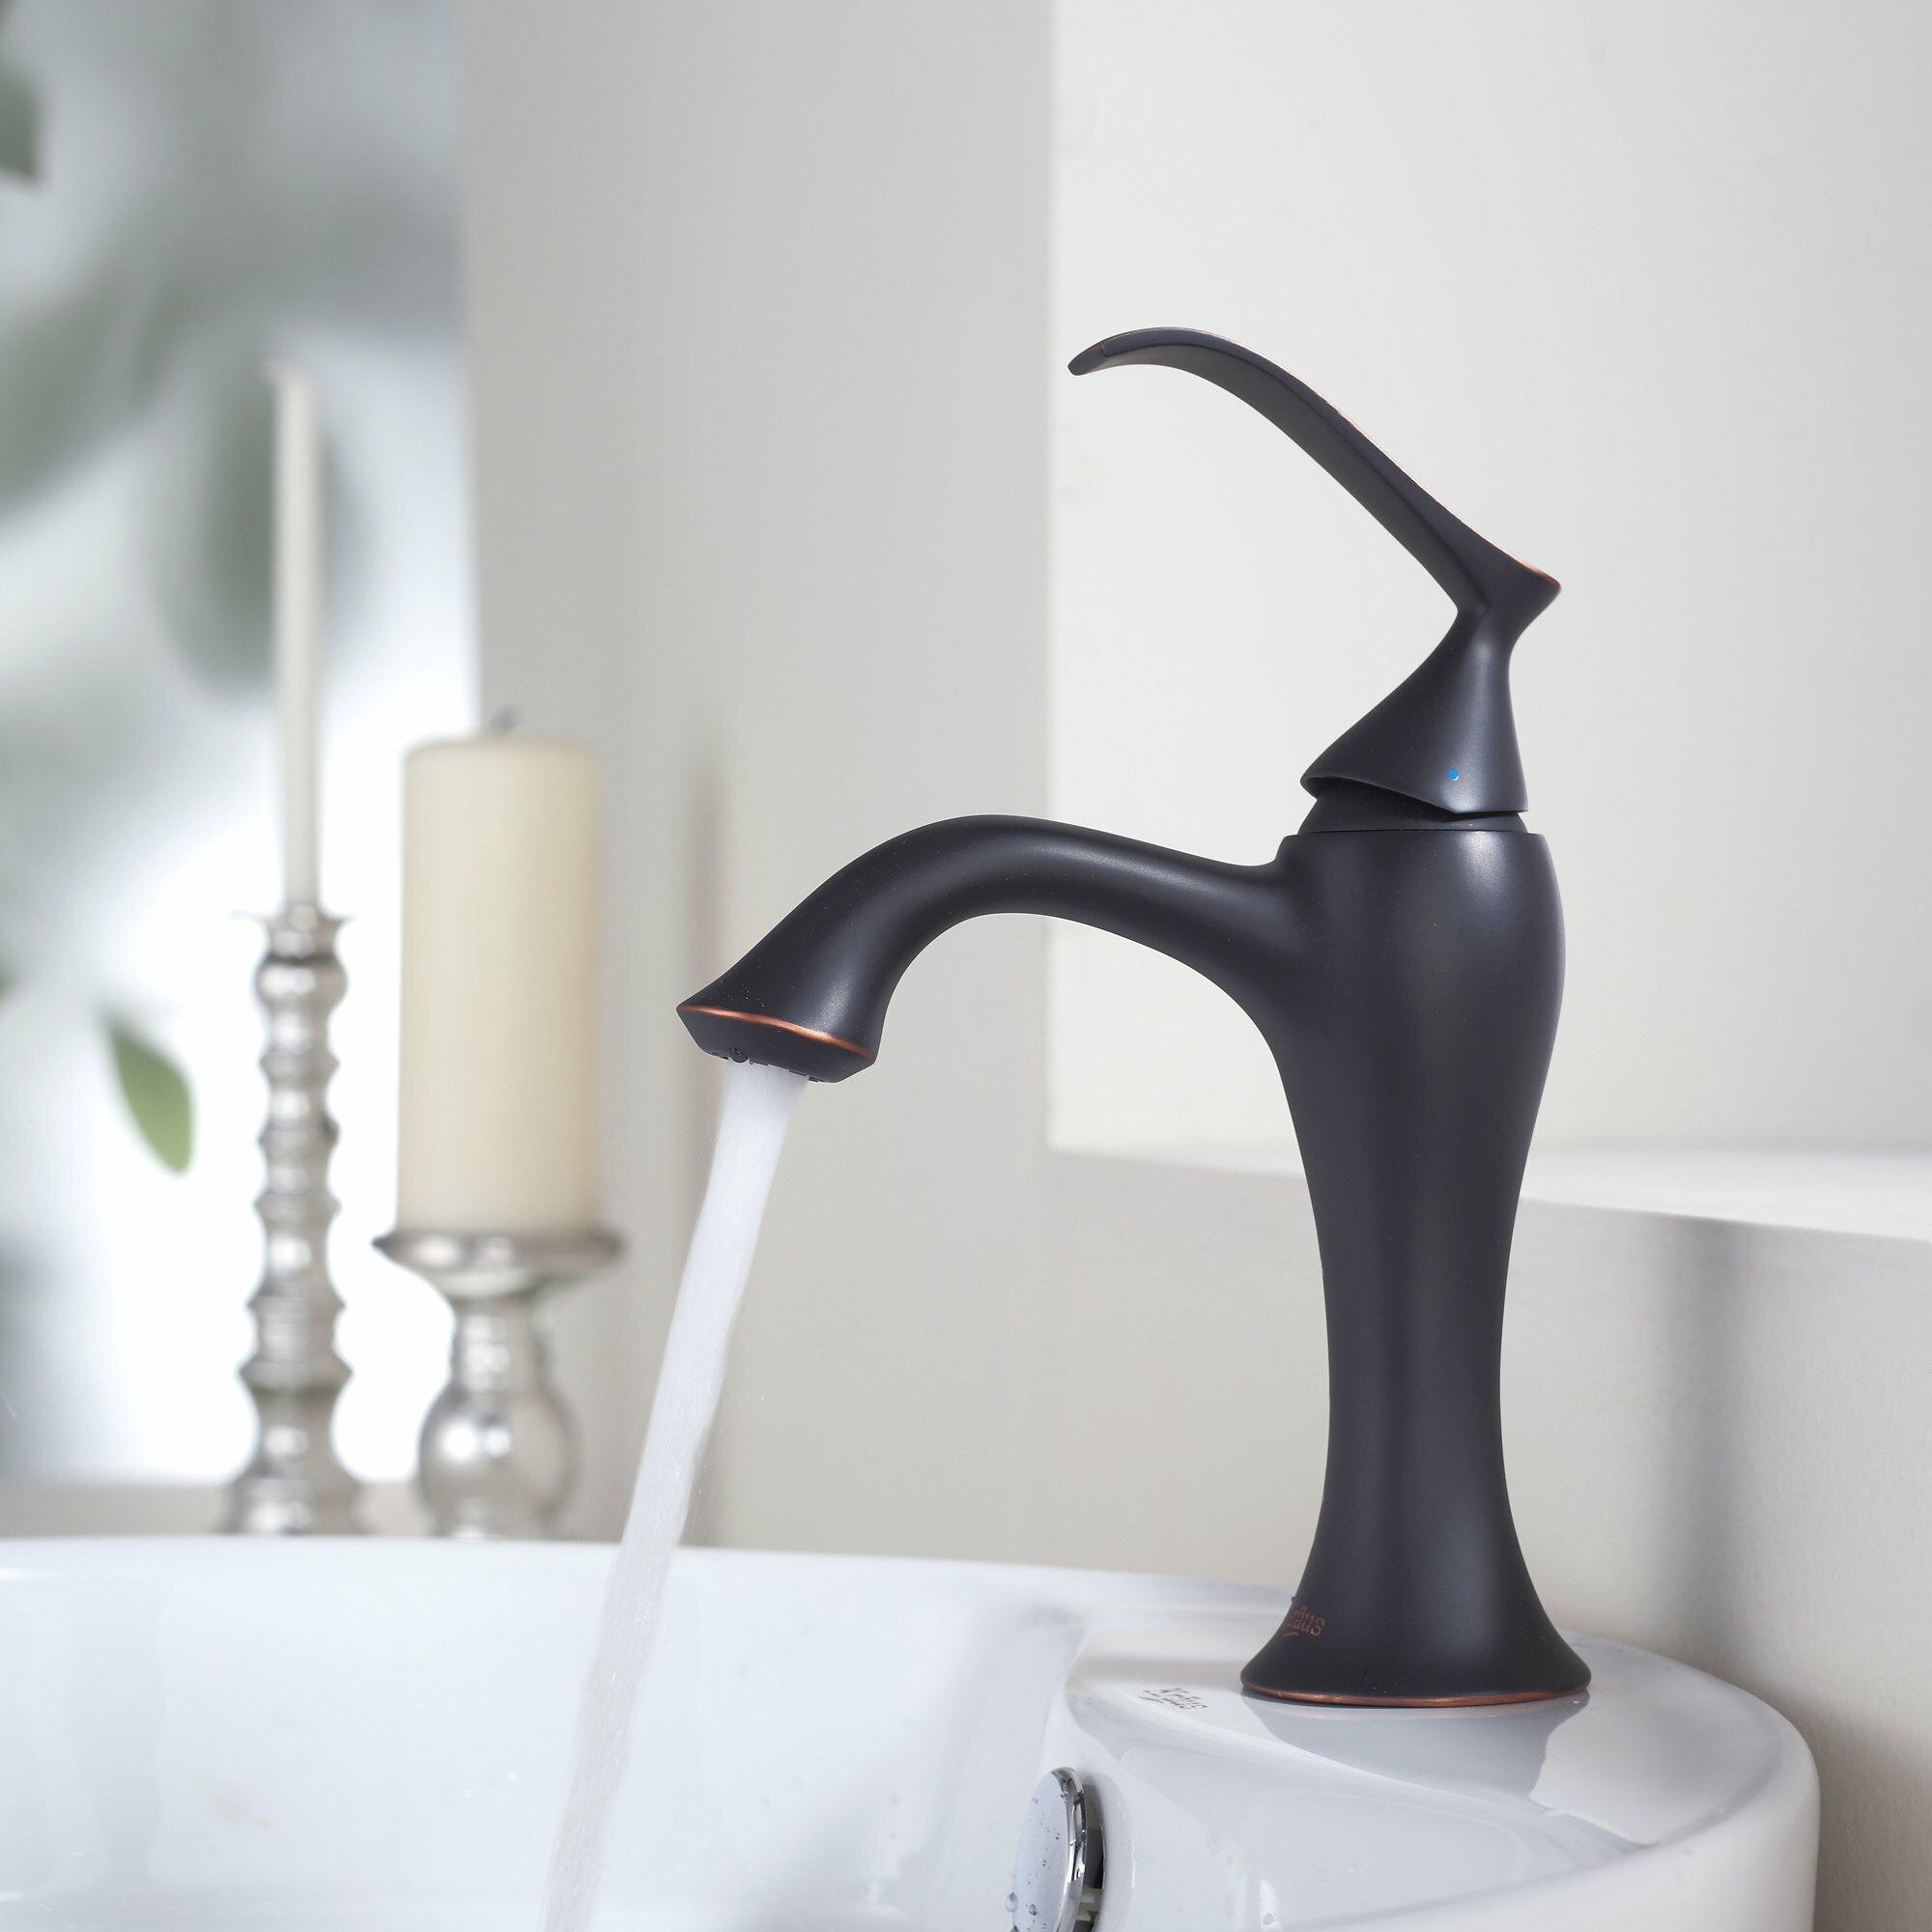 Kraus Bathroom Combos Bathroom Sink with Single Handle Single Hole ...